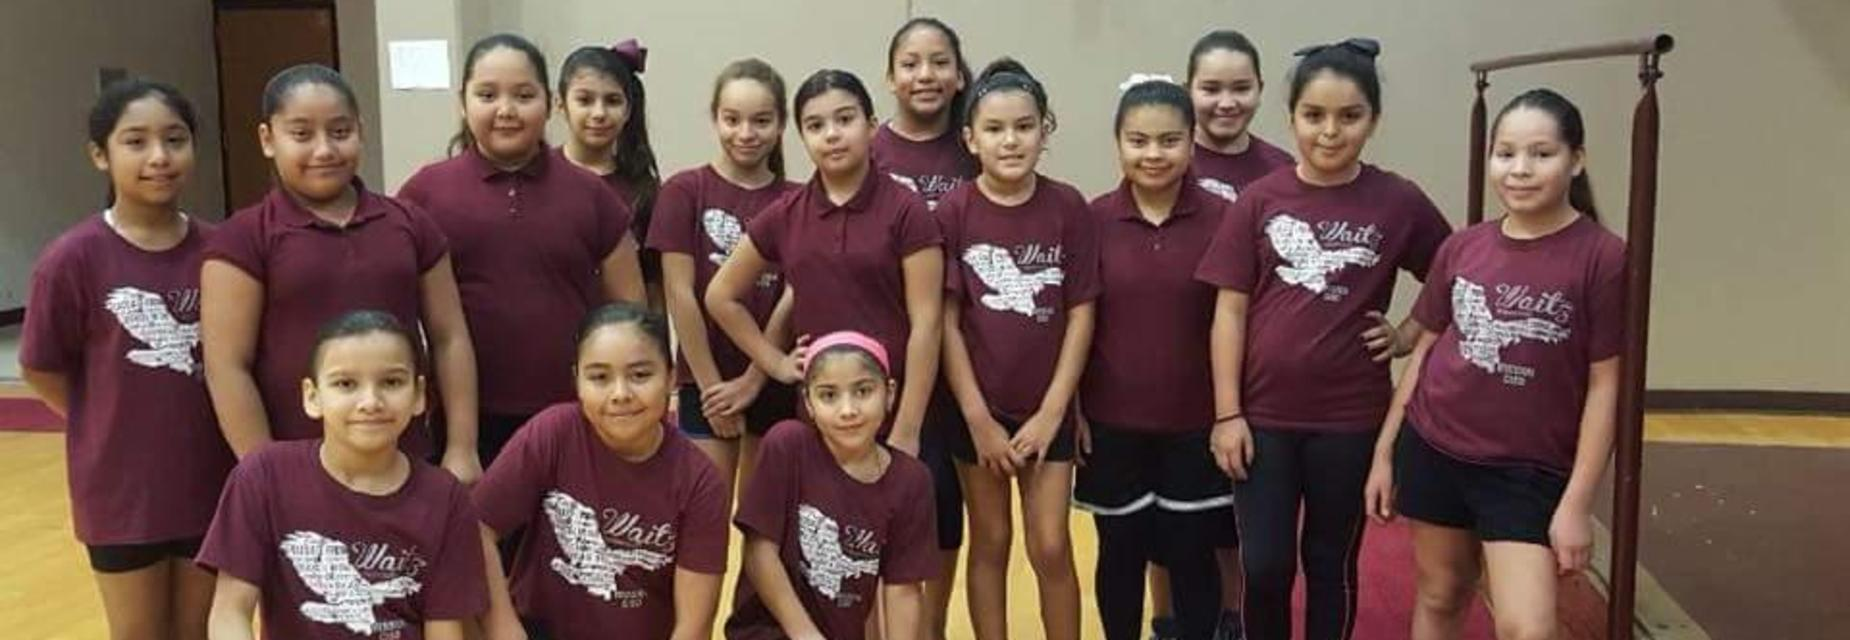 Waitz volleyball girls